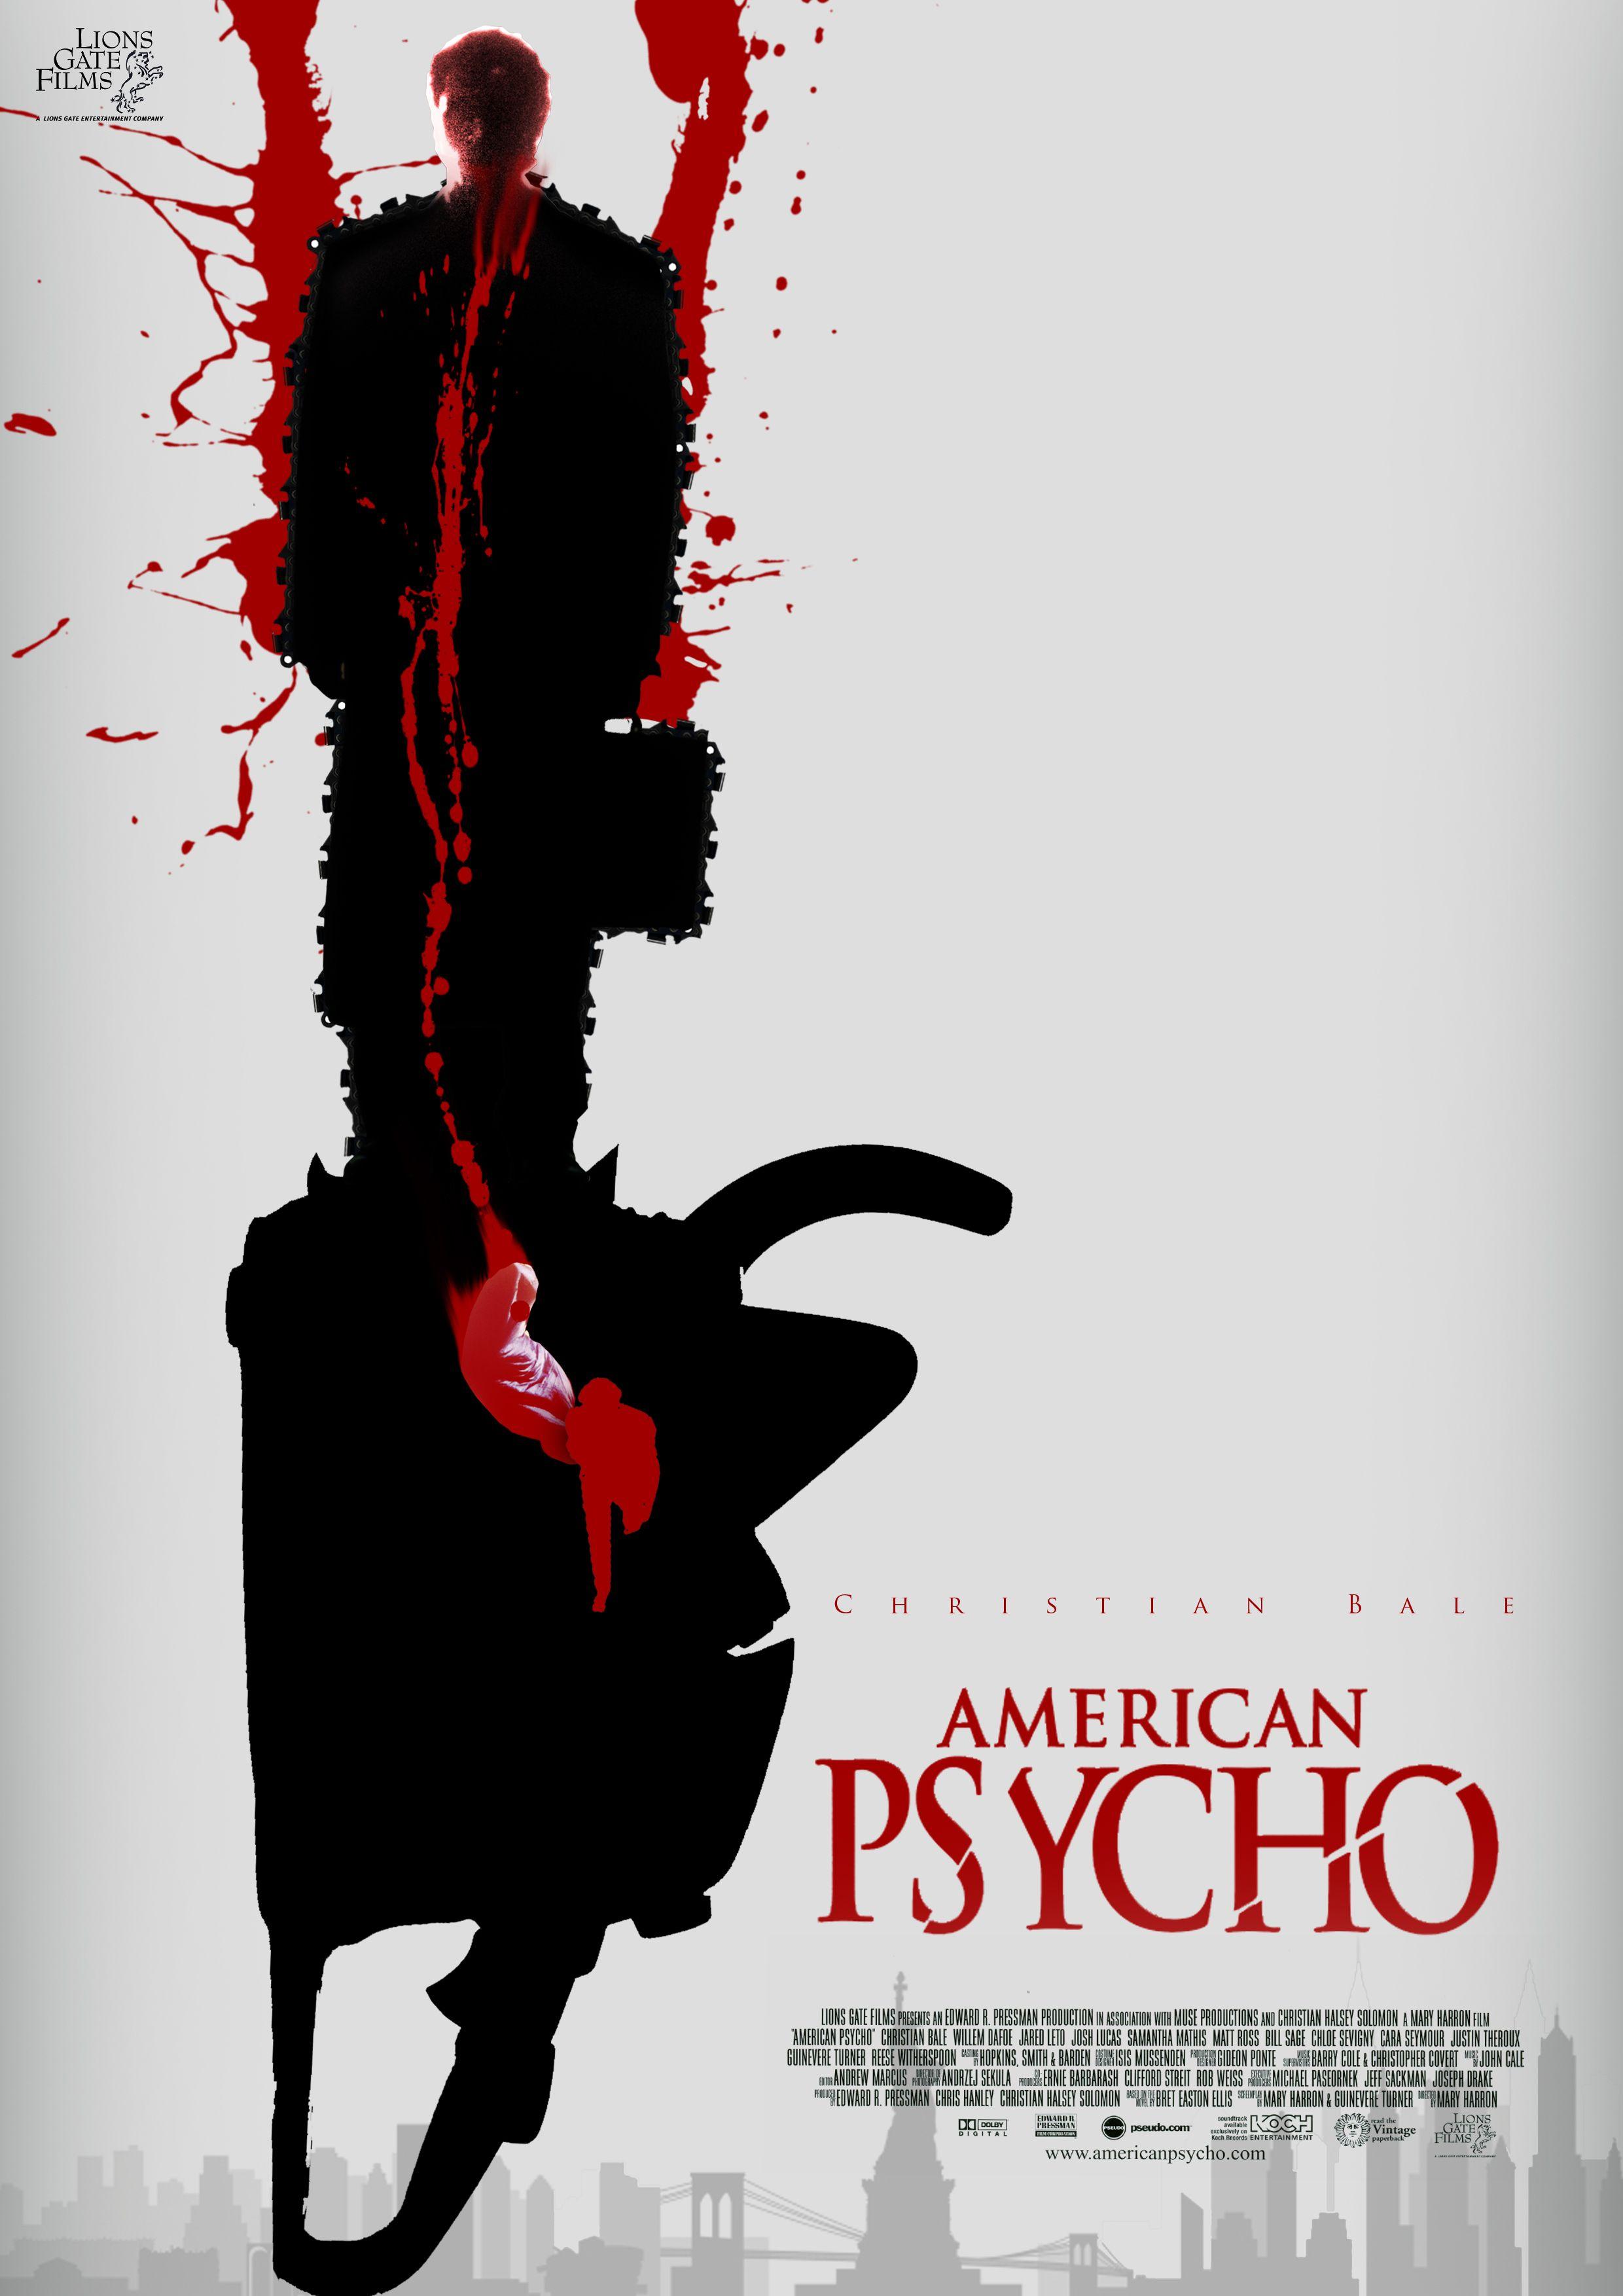 American Psycho poster Jayaram Ramachandran